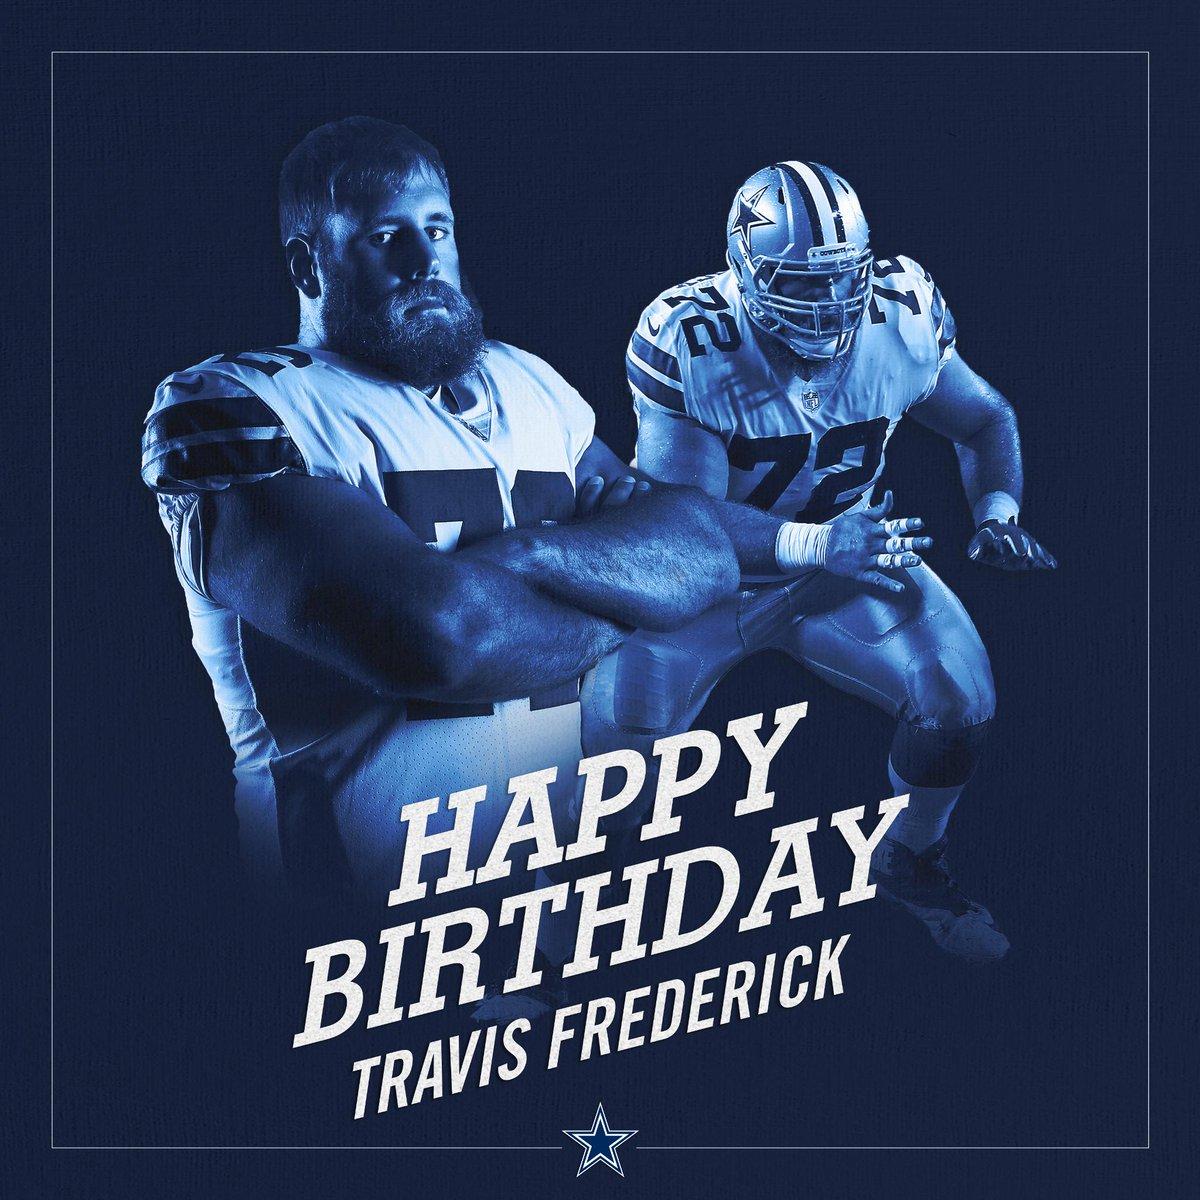 #CowboysNation, join us in wishing @tfrederick72 a happy birthday!<br>http://pic.twitter.com/TBkTG7vBuz